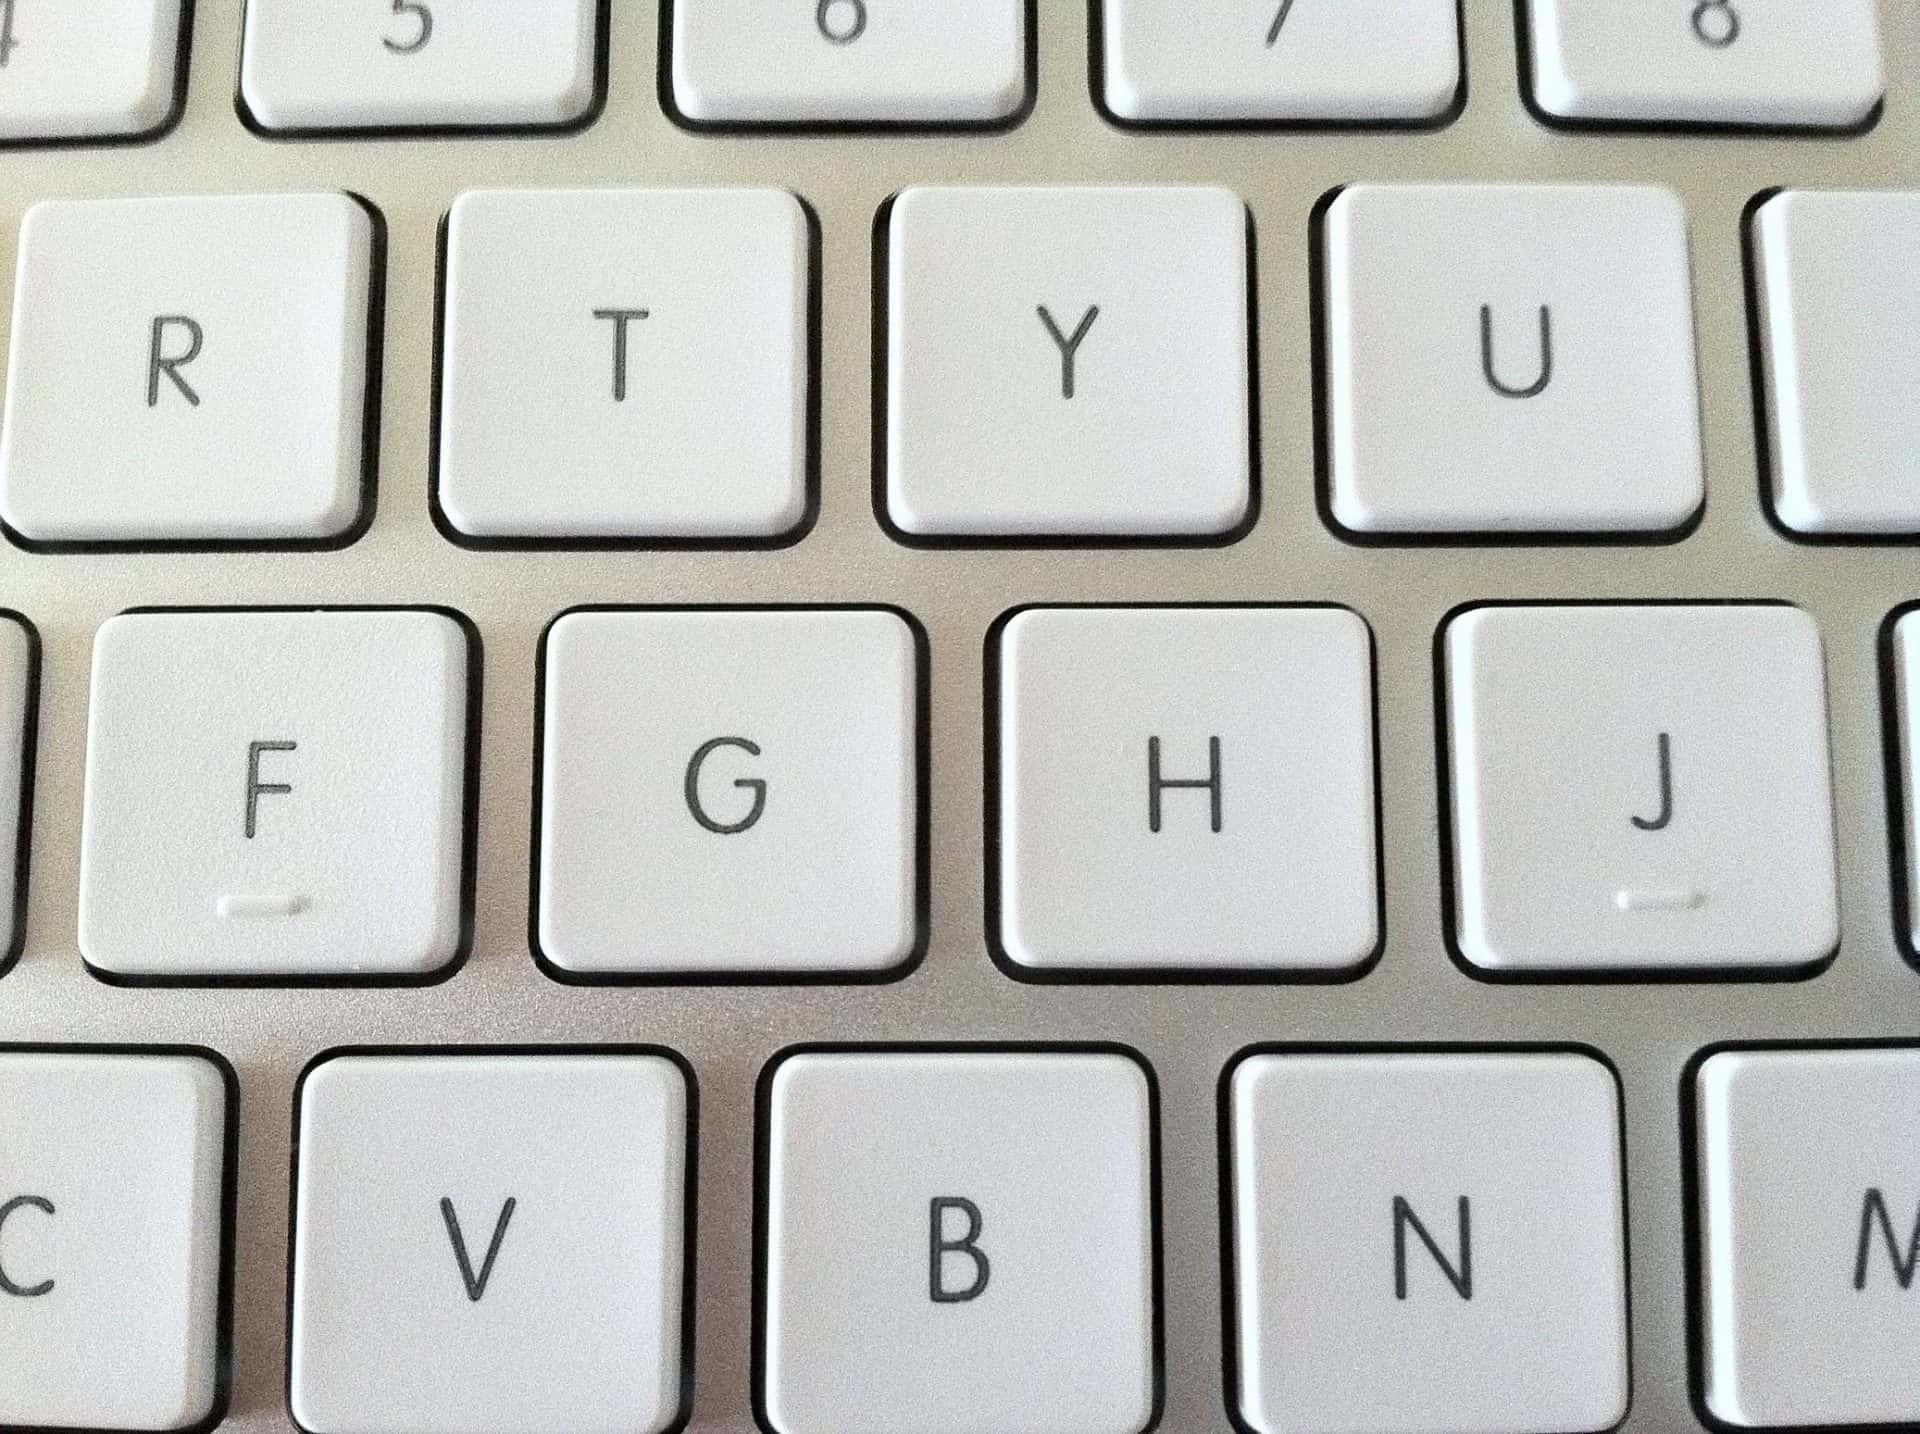 Two Keyboard Bumps